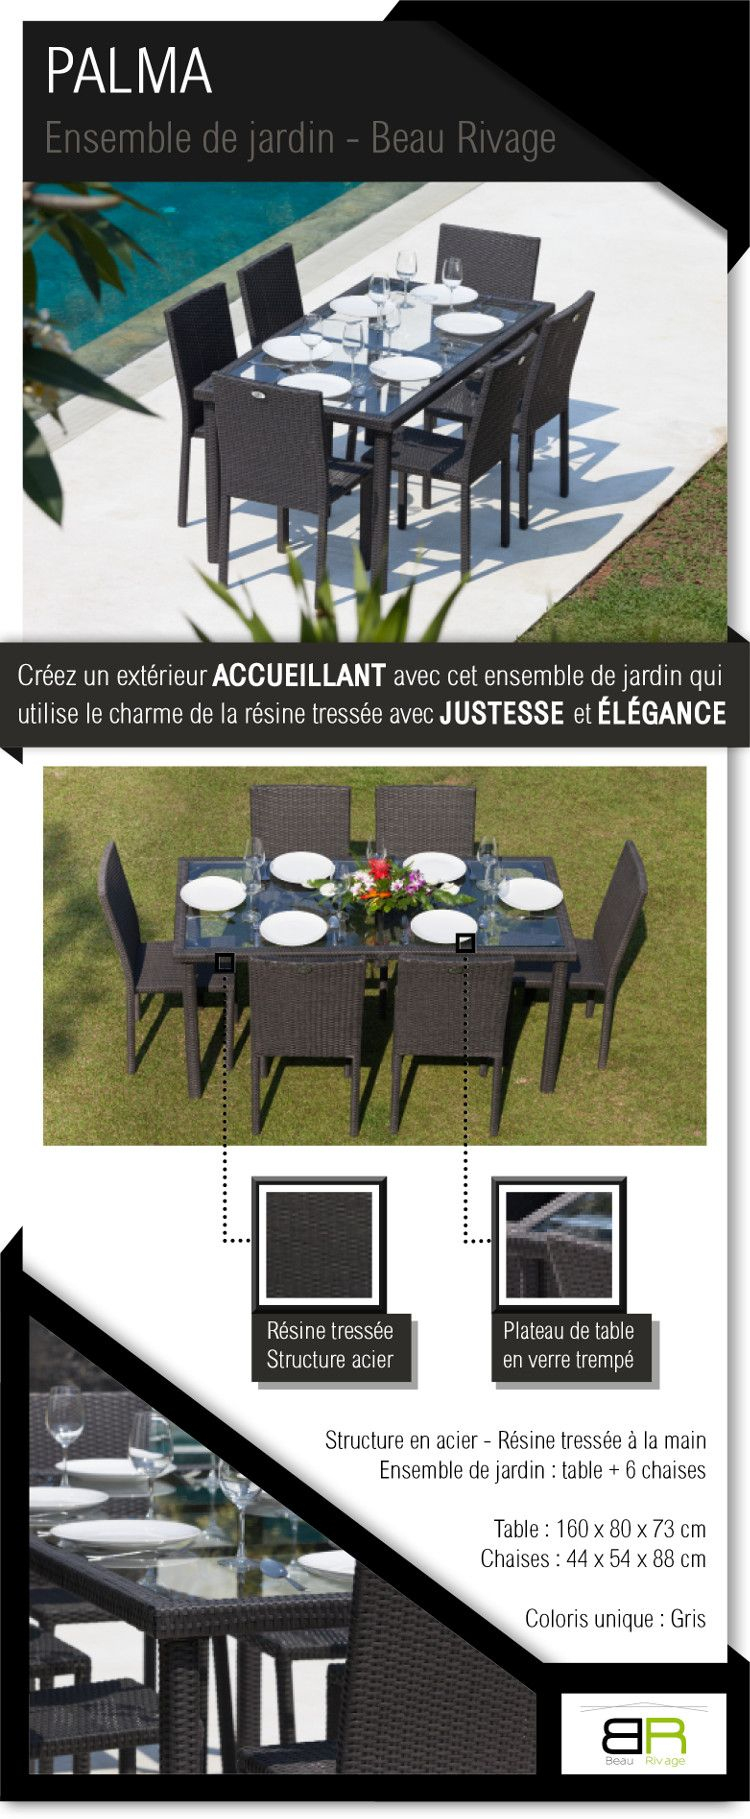 Salon De Jardin | Ensemble Table De Jardin, Table De Jardin ... avec Salon De Jardin Vente Unique